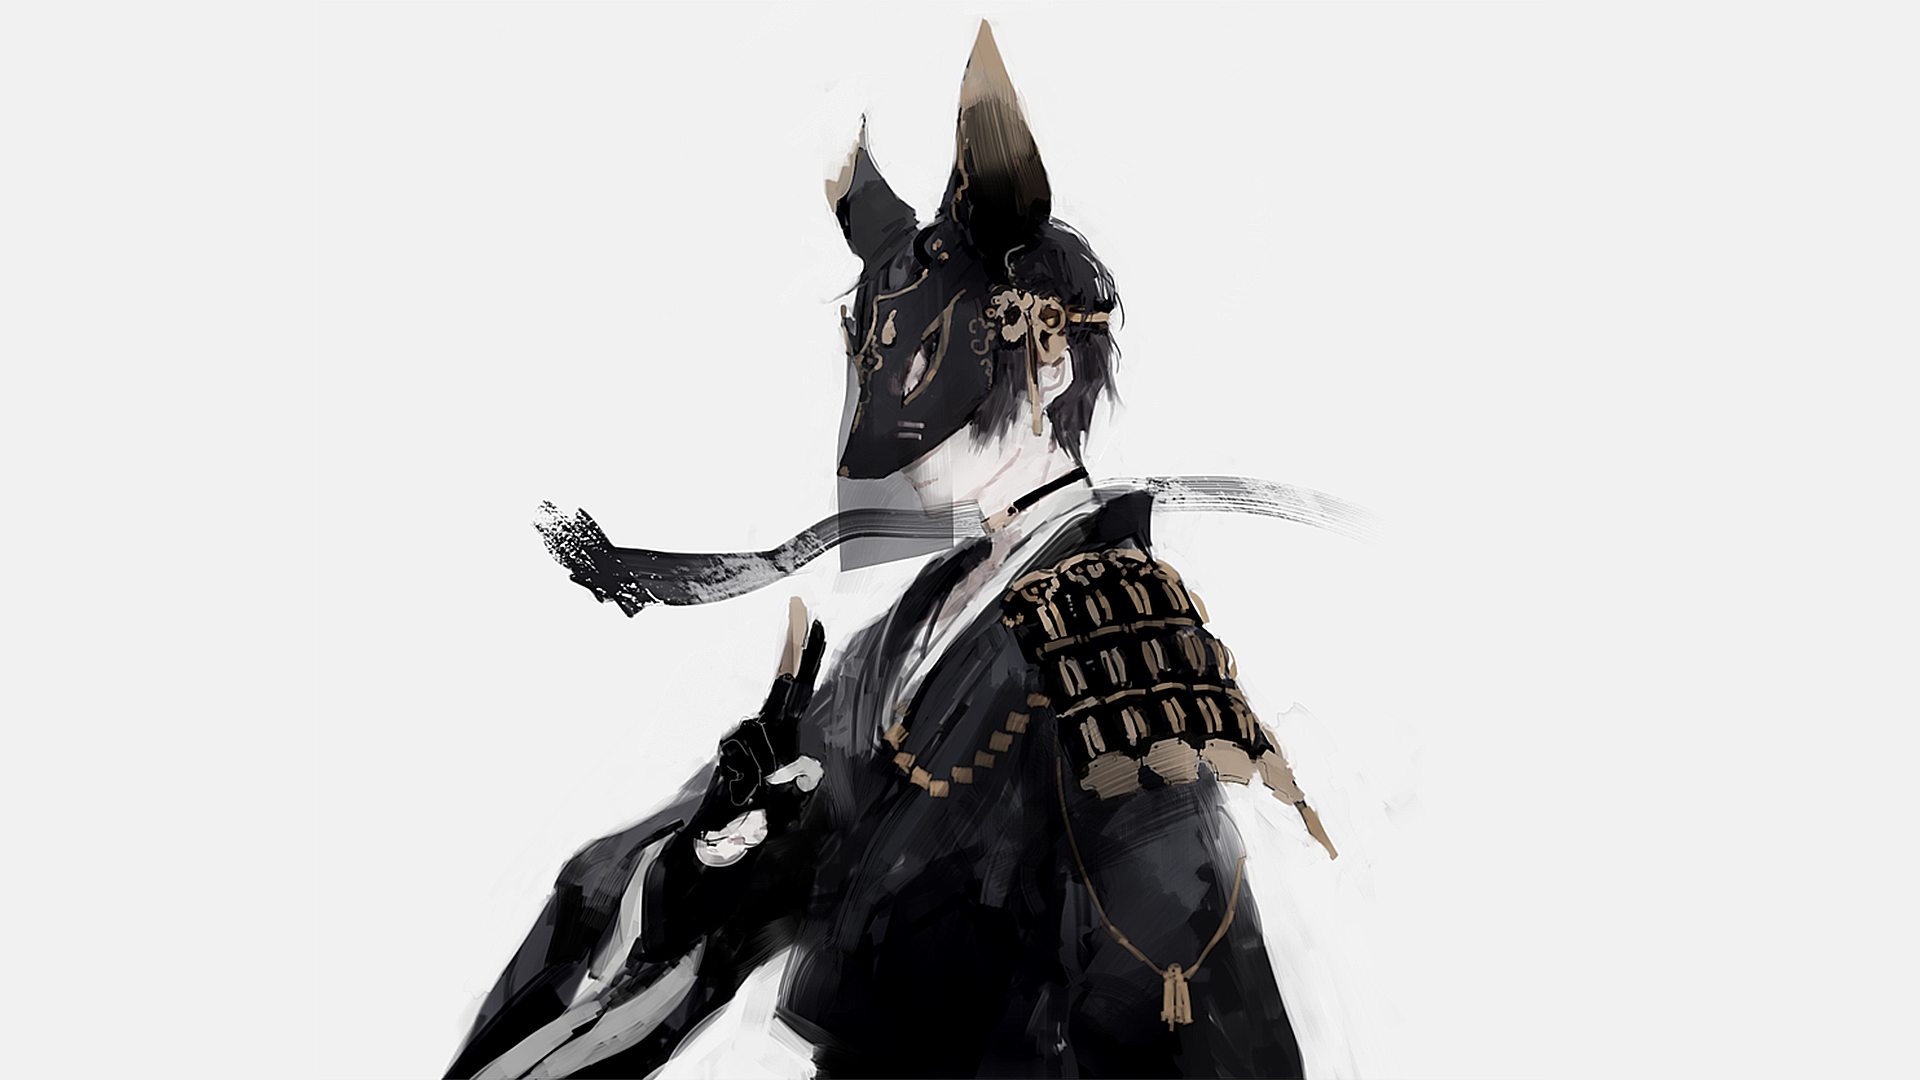 Black Fox [1920x1080] Need iPhone 6S Plus Wallpaper/